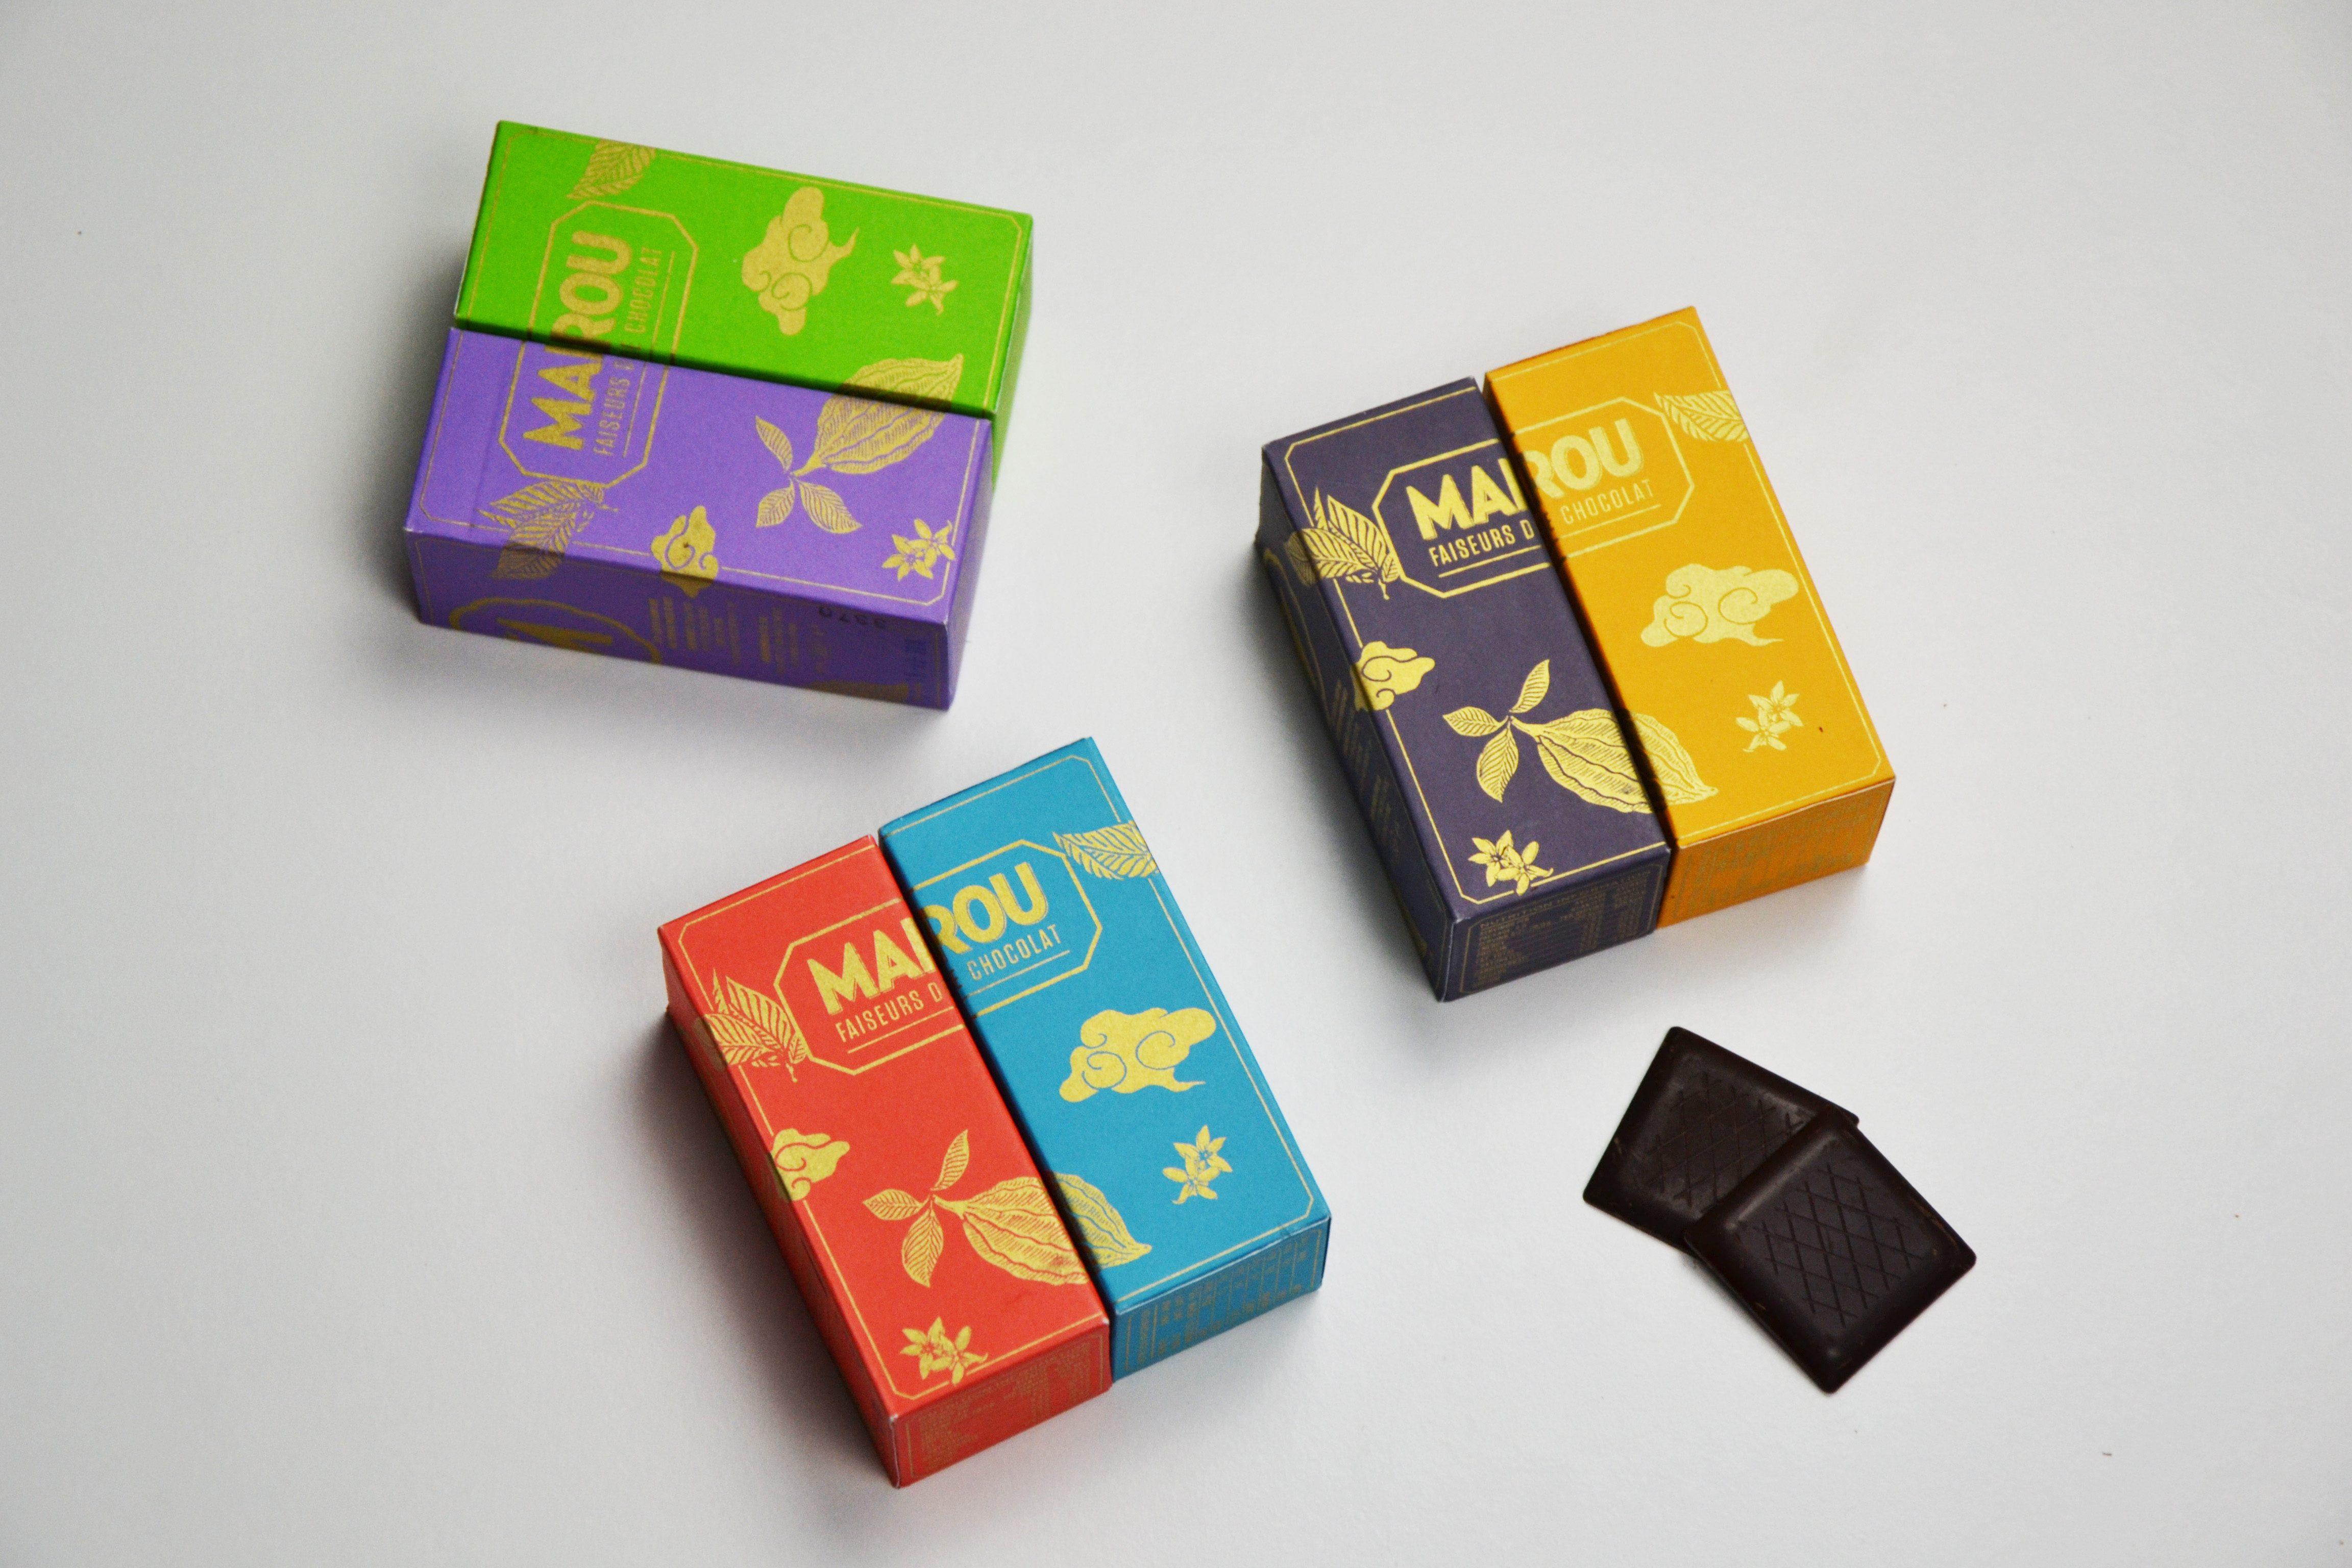 Napolitains Marou – Chocolat Noir